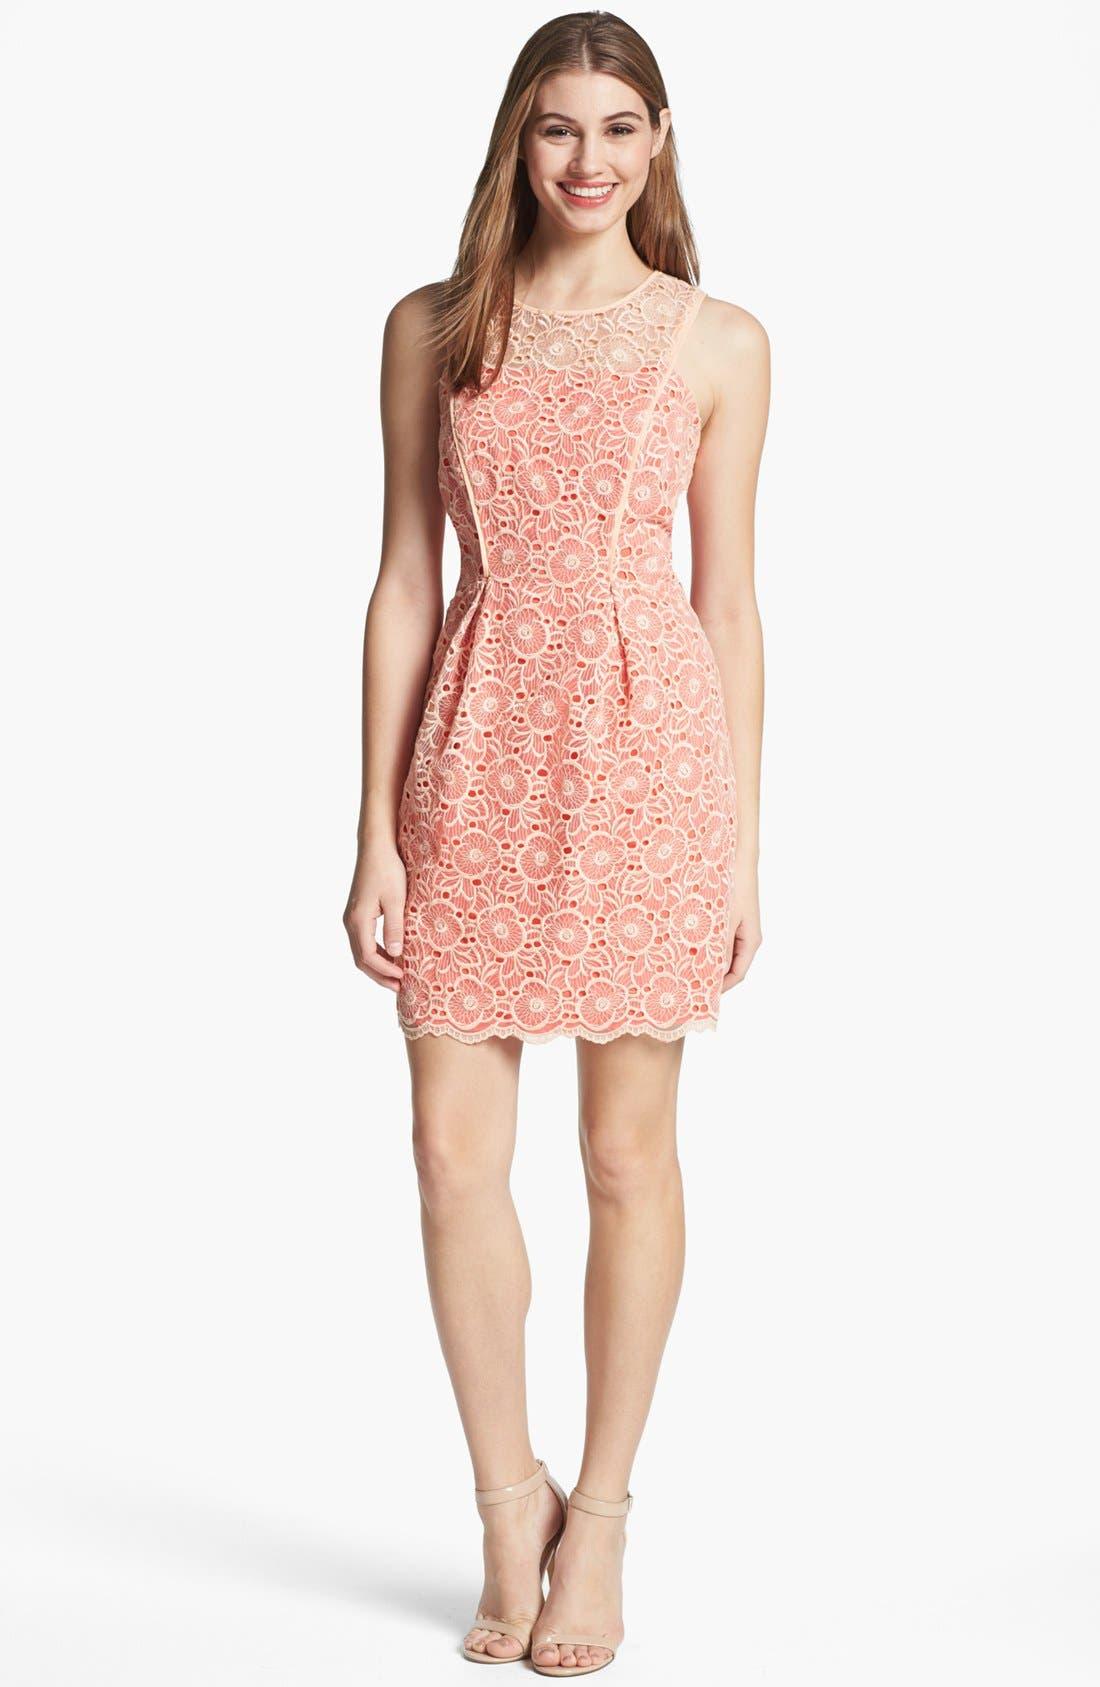 Main Image - Jessica Simpson Lace Overlay Dress